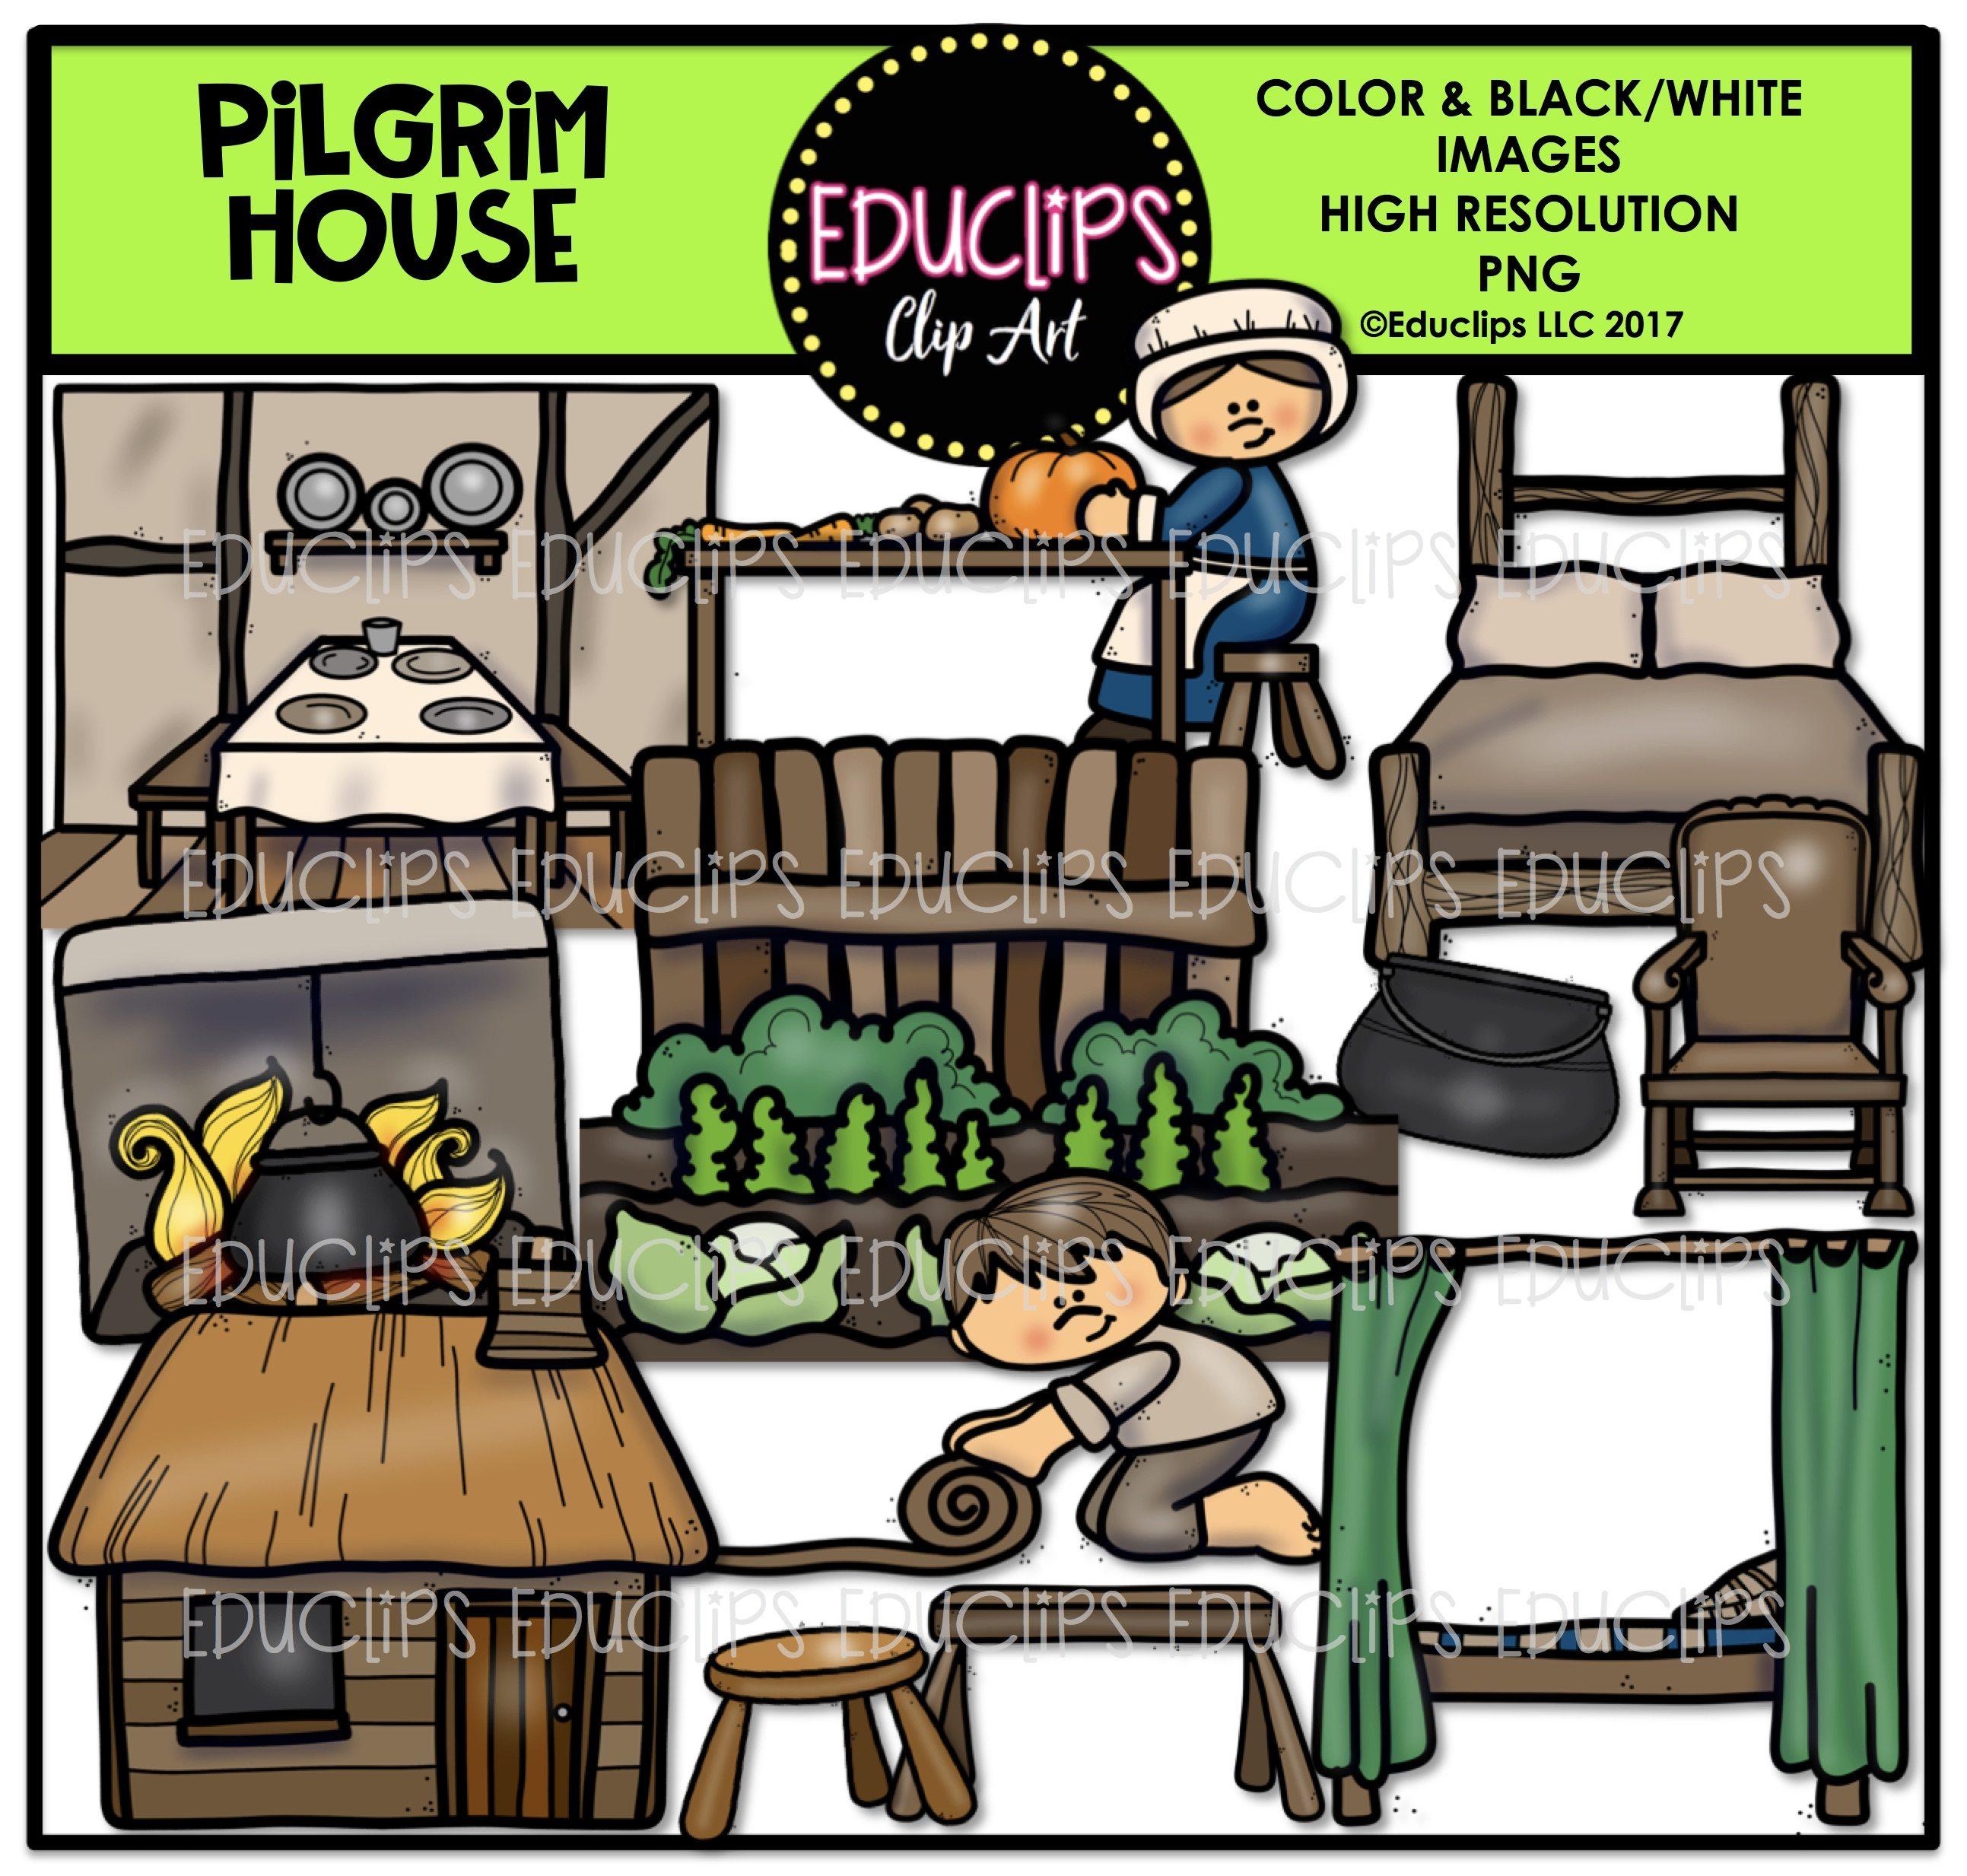 Thanksgiving clip art big. Cabin clipart pilgrim house